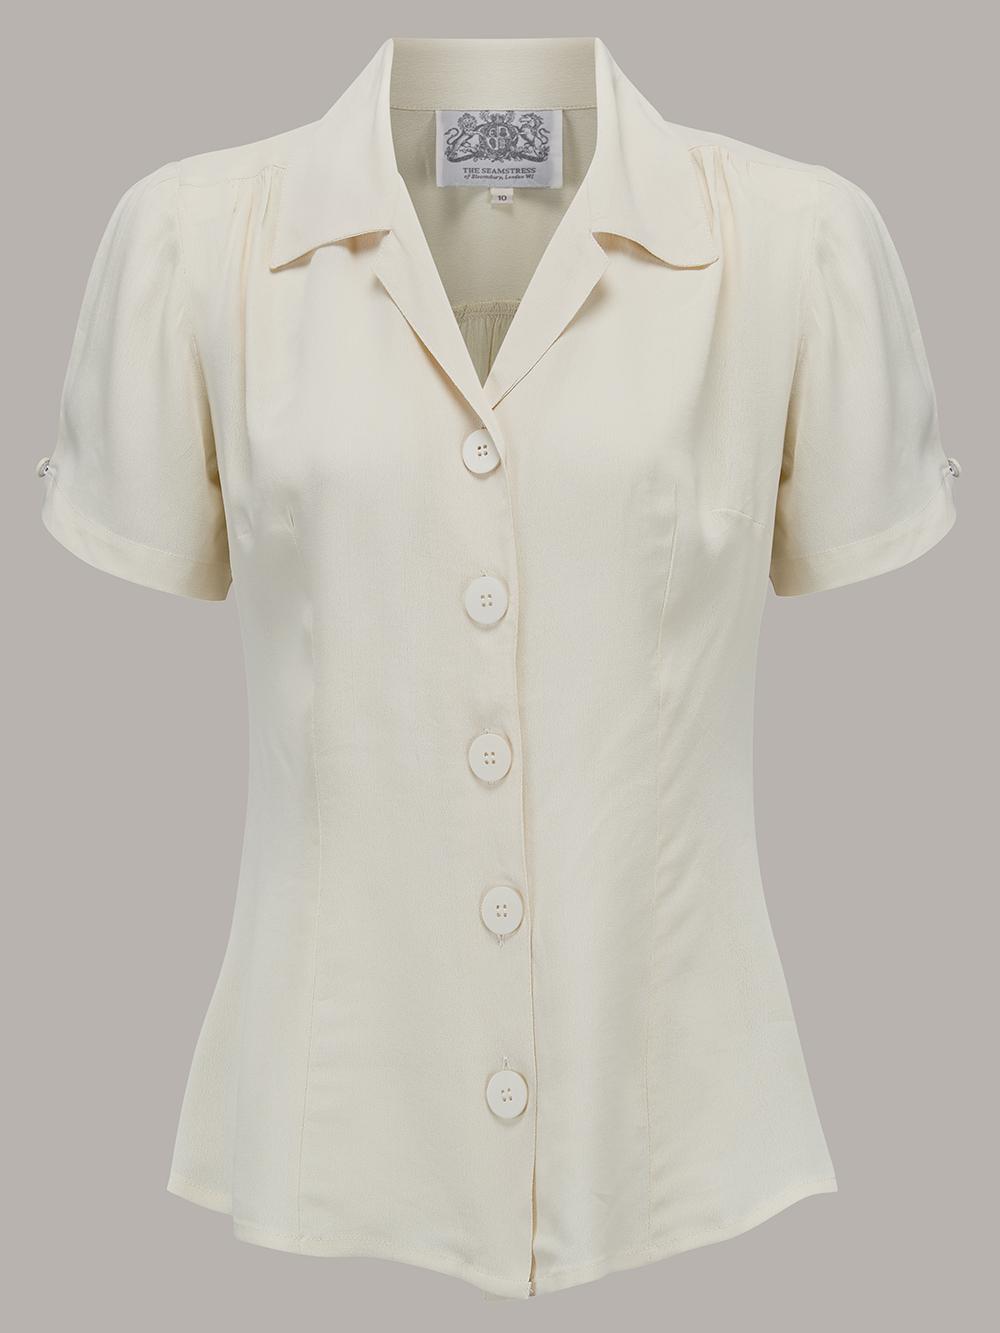 1940s Dresses and Clothing UK | 40s Shoes UK Grace Blouse - Powder Blue 8 £39.00 AT vintagedancer.com